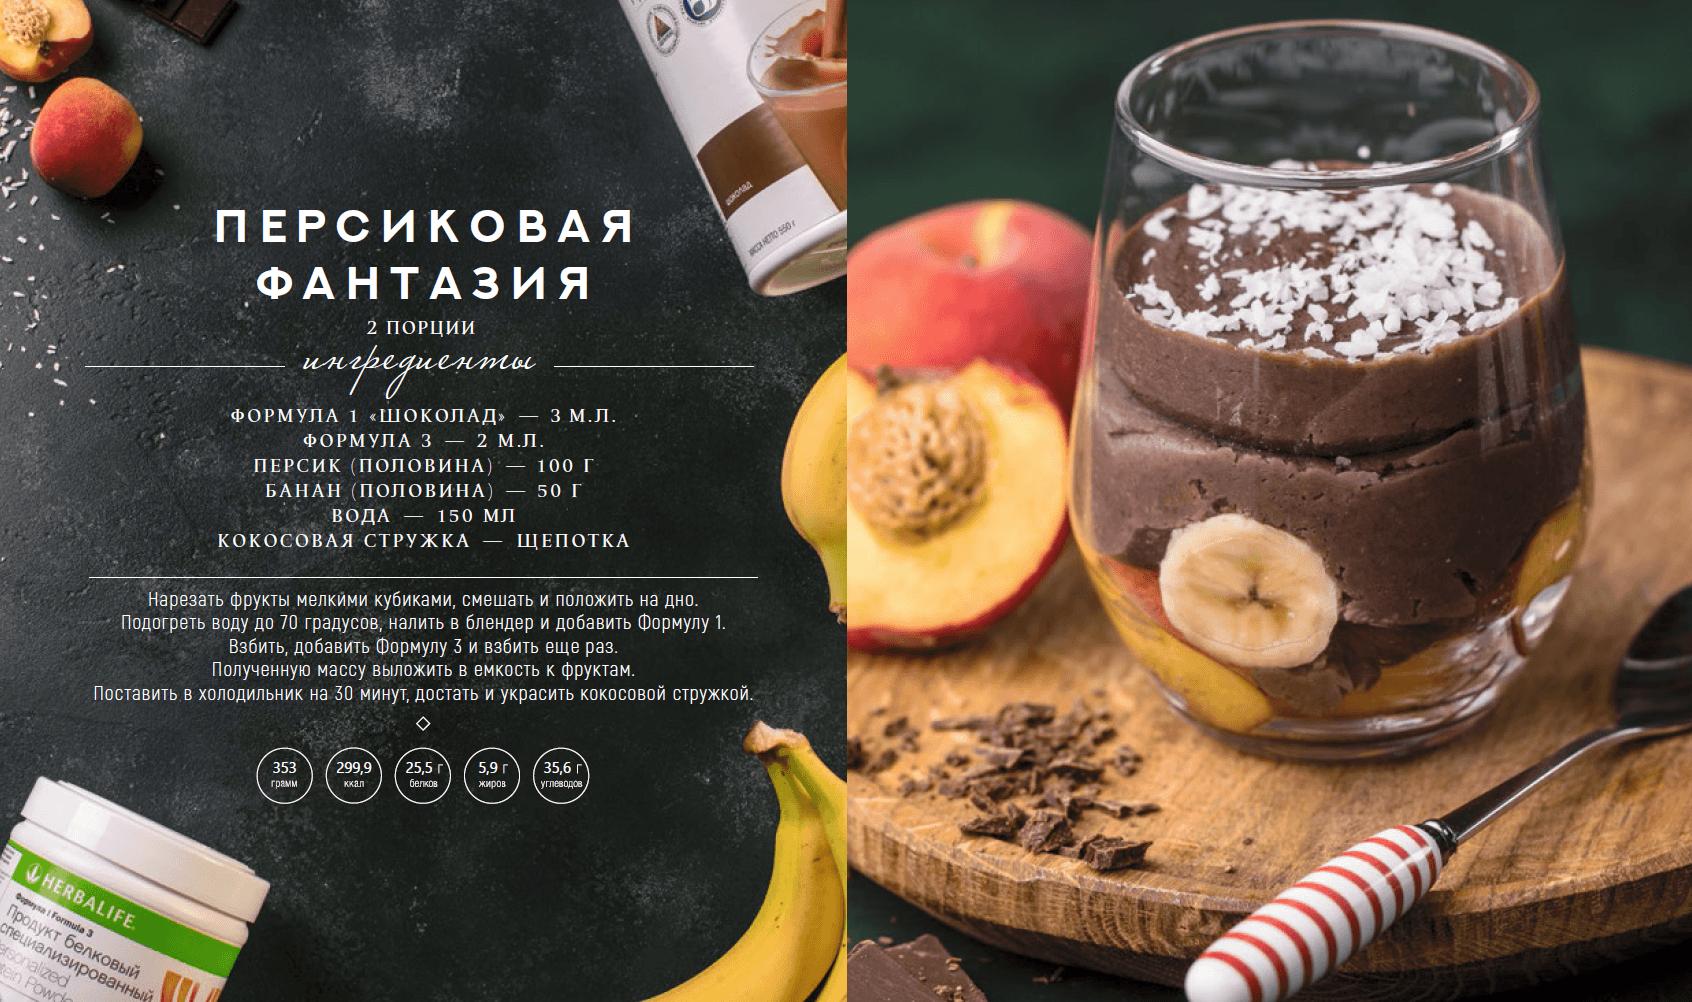 персиковая фантазия пудинг рецепт гербалайф